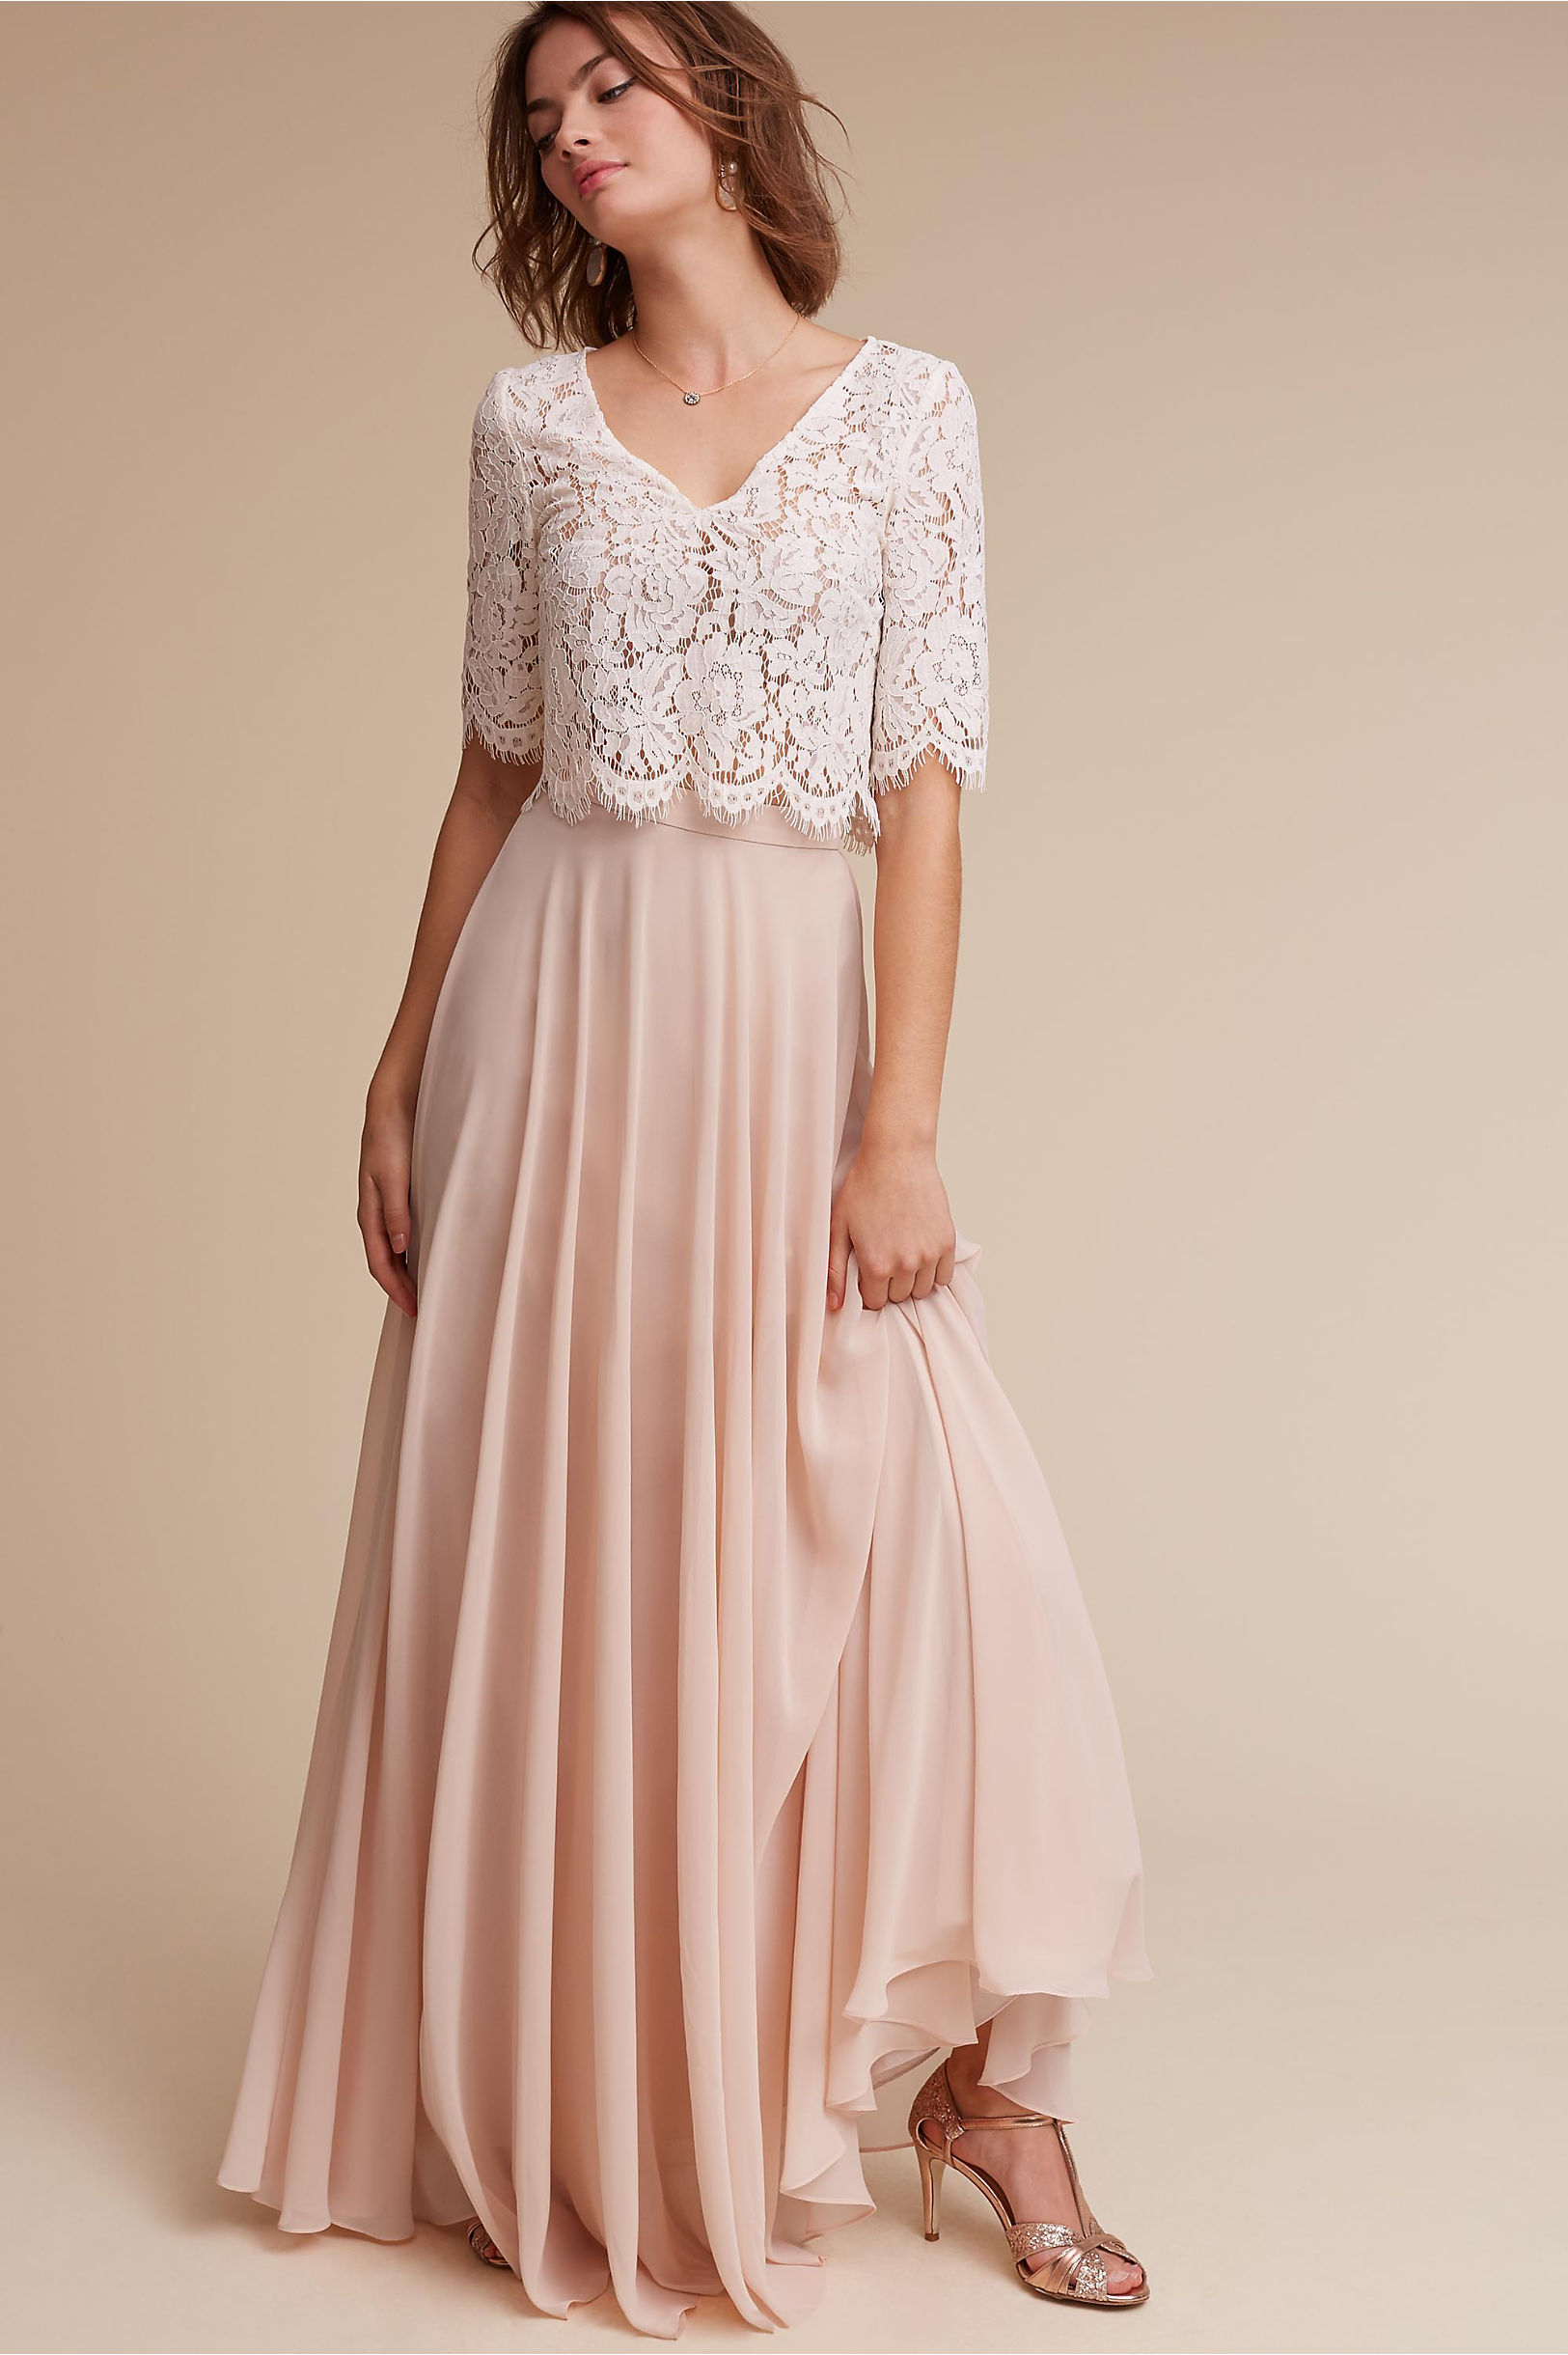 Lace bridesmaid dresses long short styles bhldn libby top hampton skirt ombrellifo Choice Image